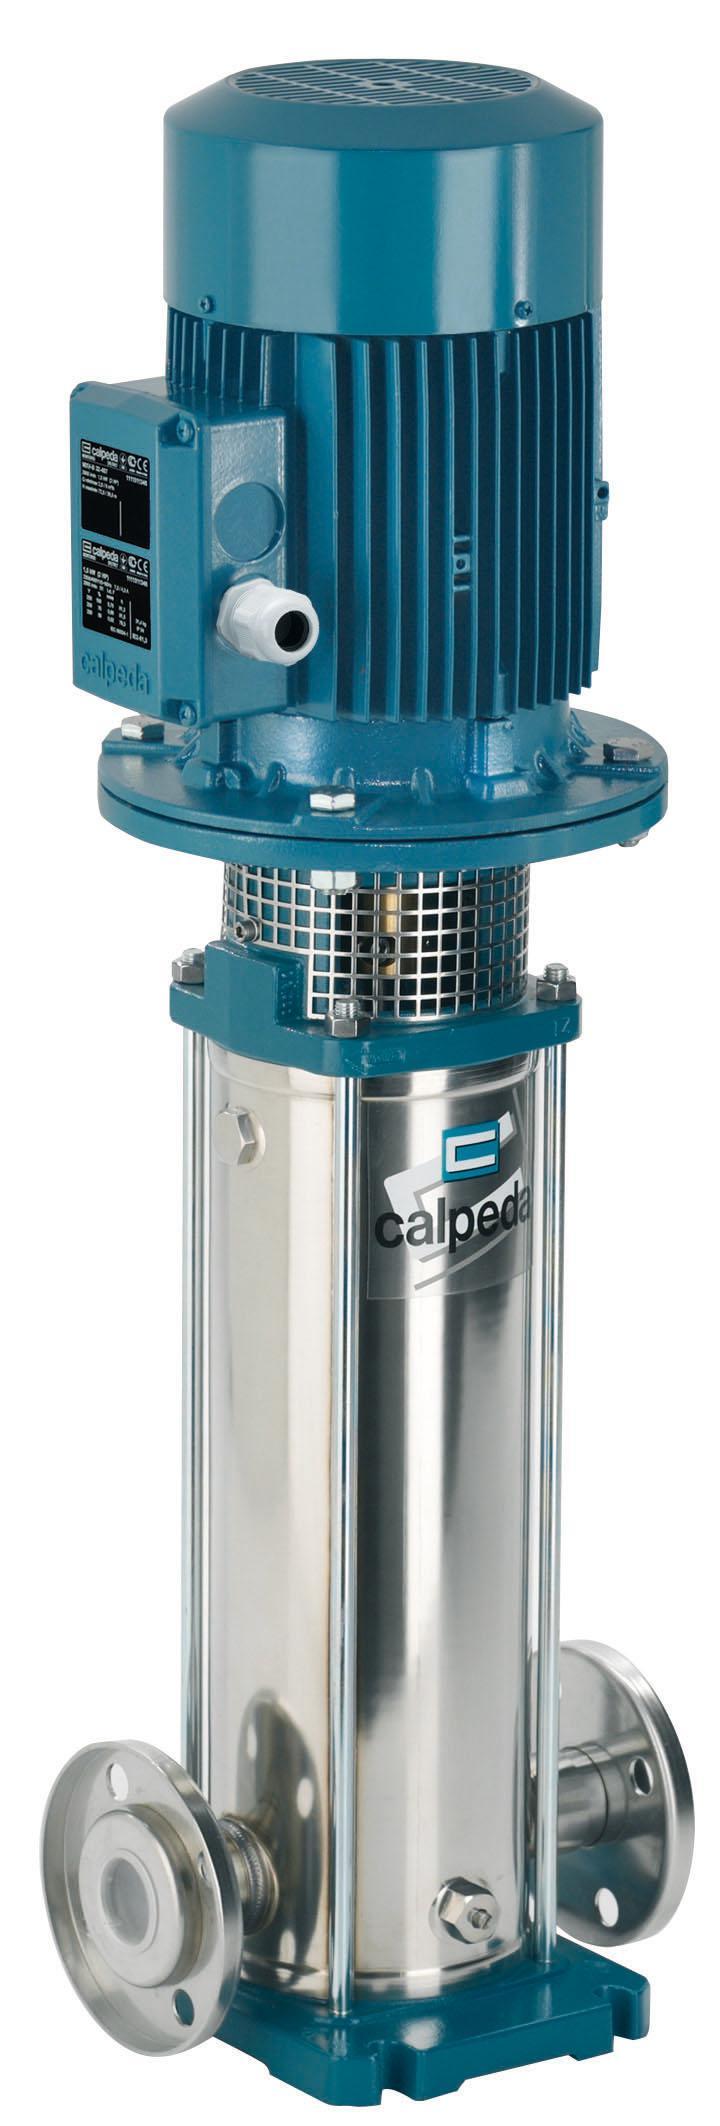 Насос Calpeda Mxv 32-412/c 230/400/50 hz m100 v1-3t